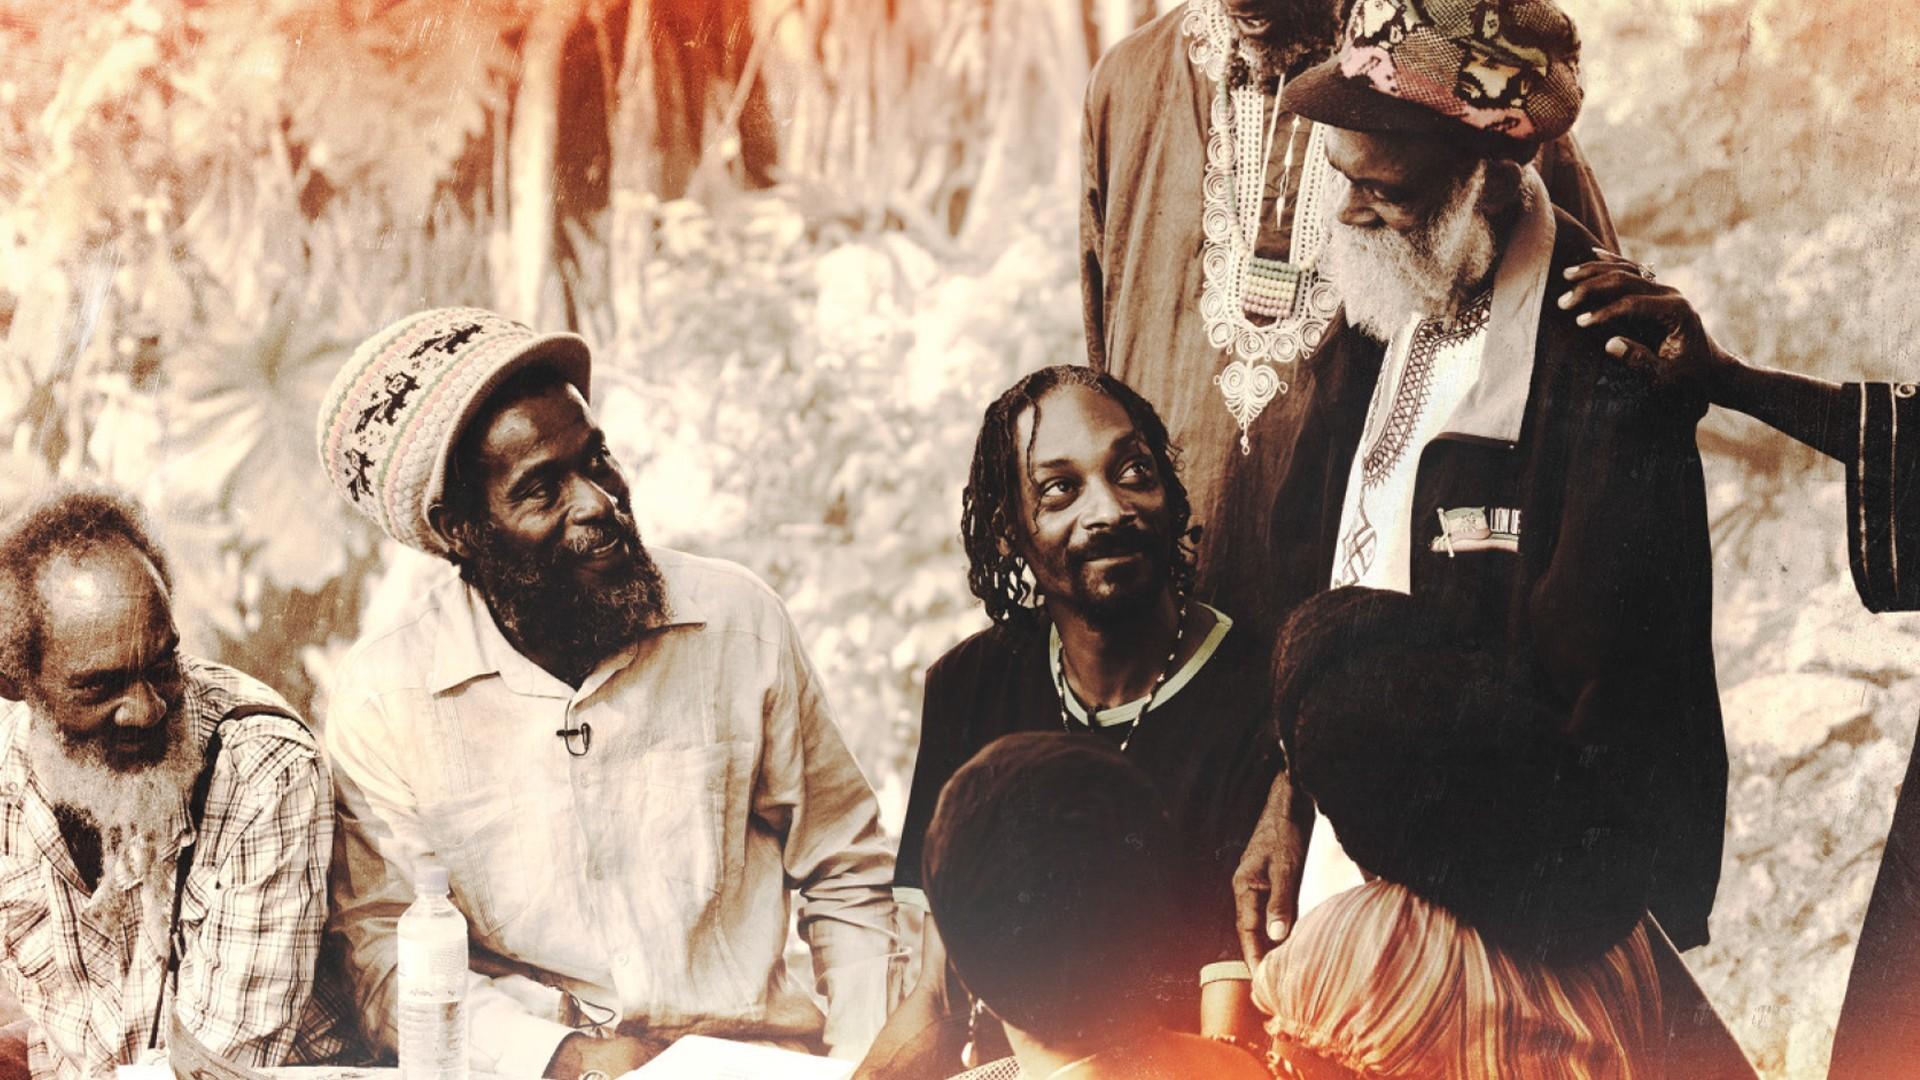 Snoop Dogg Rasta Reggae Lions Lion Album Wallpaper - Snoop Dogg Reggae , HD Wallpaper & Backgrounds